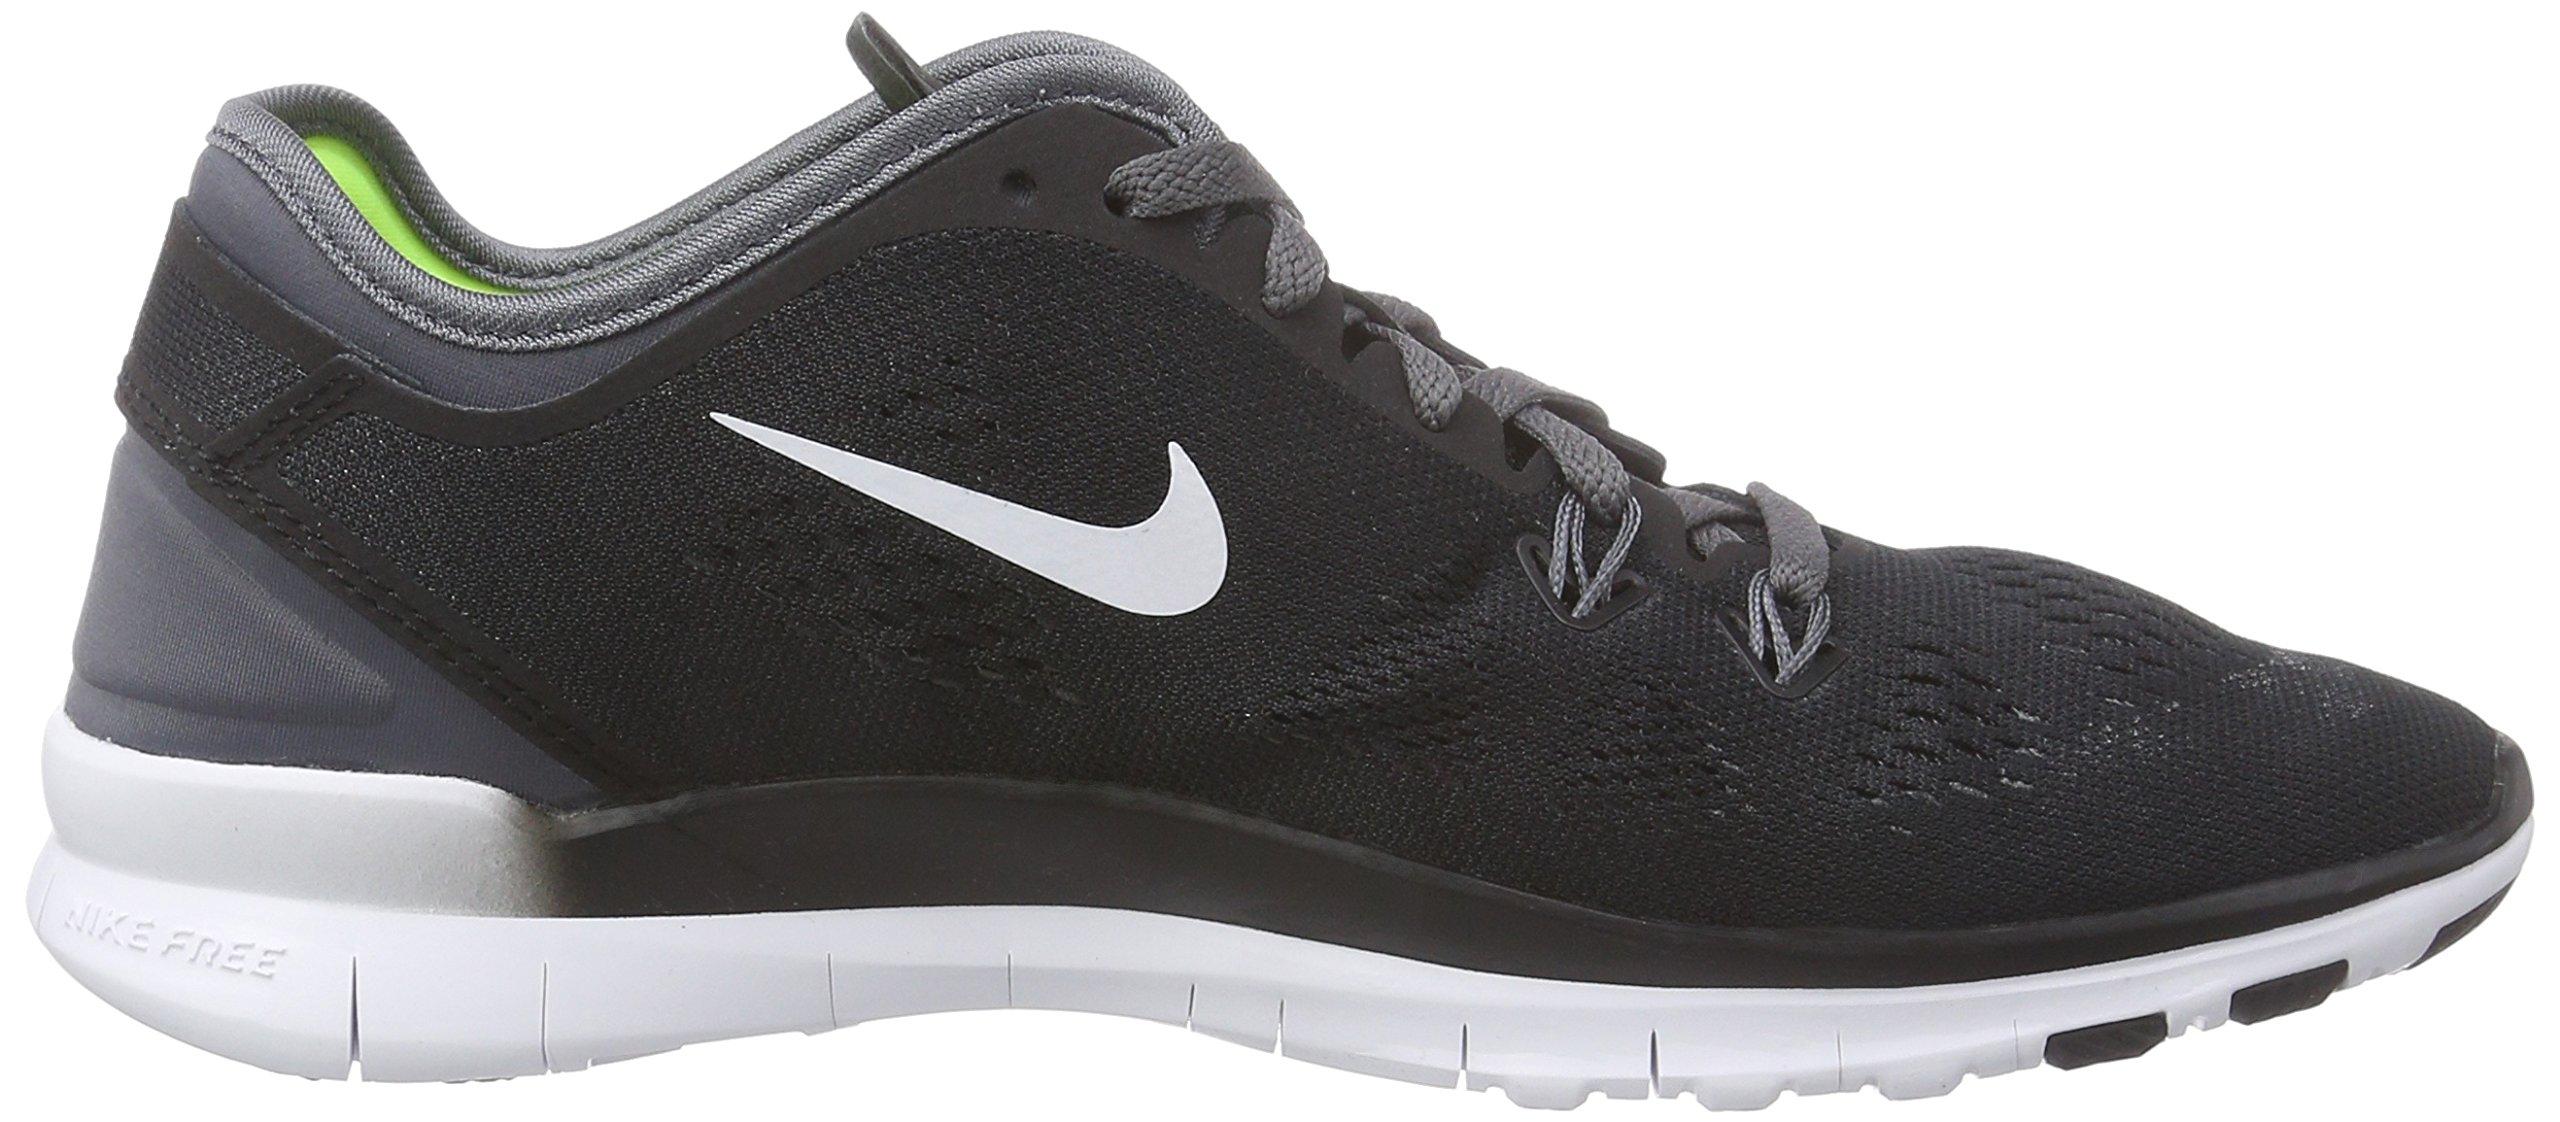 Nike Womens Free 5.0 Tr Fit 5 Black/White/Dark Grey/White Training Shoe 5 Women US by Nike (Image #6)